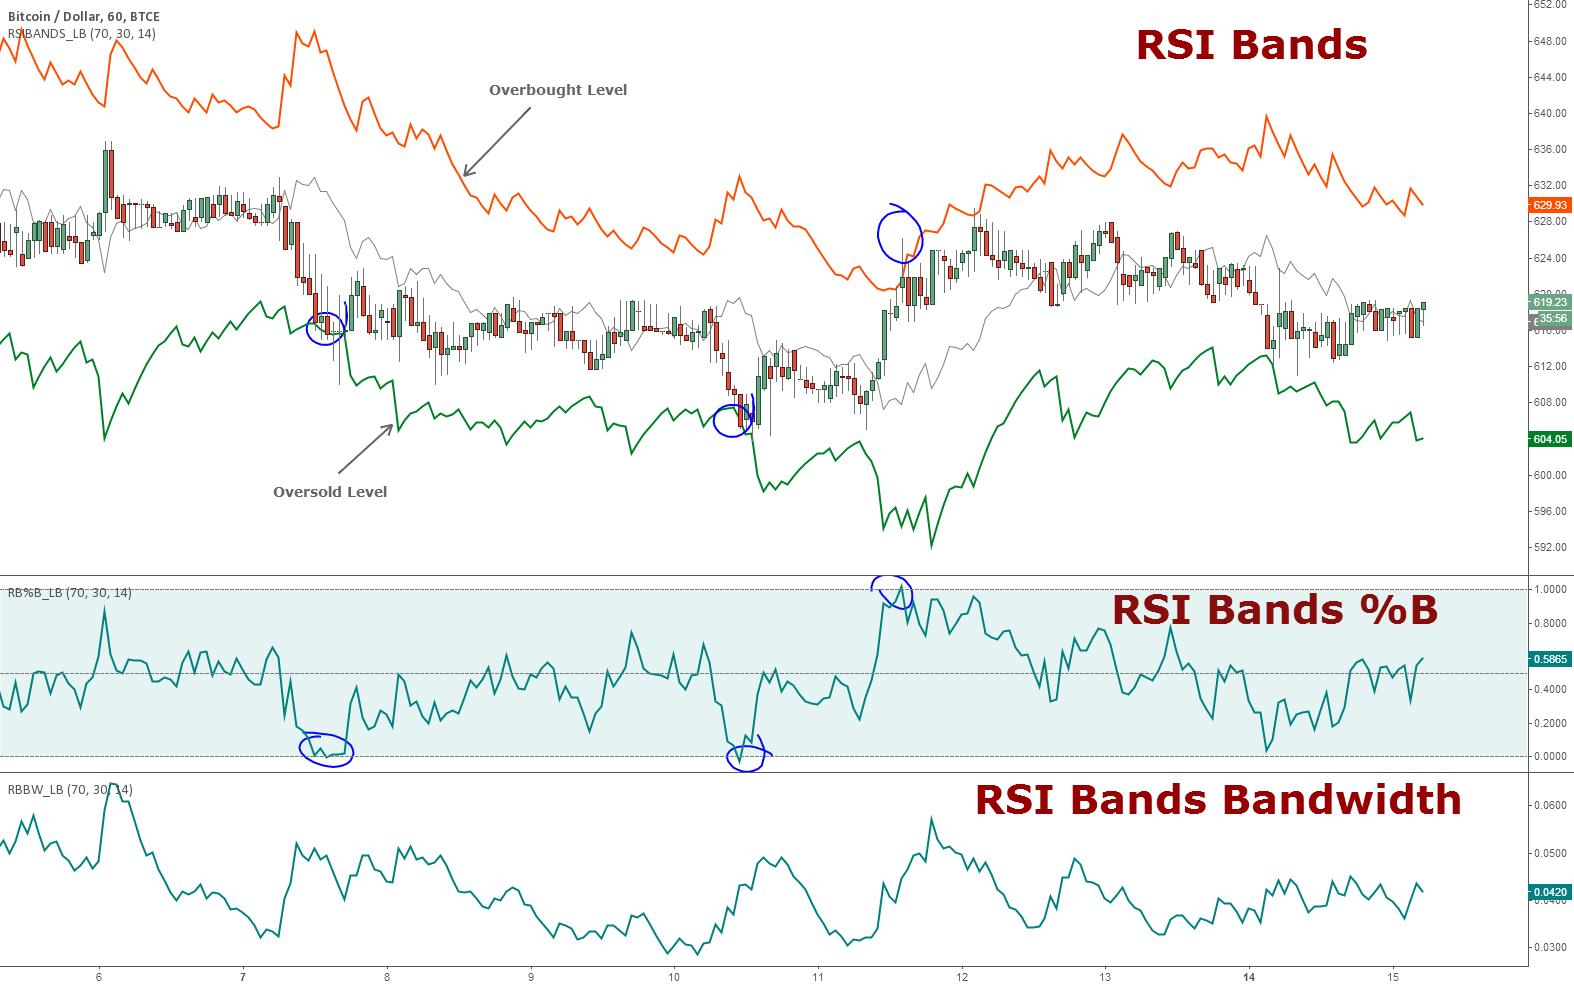 RSI Bands, RSI %B and RSI Bandwidth